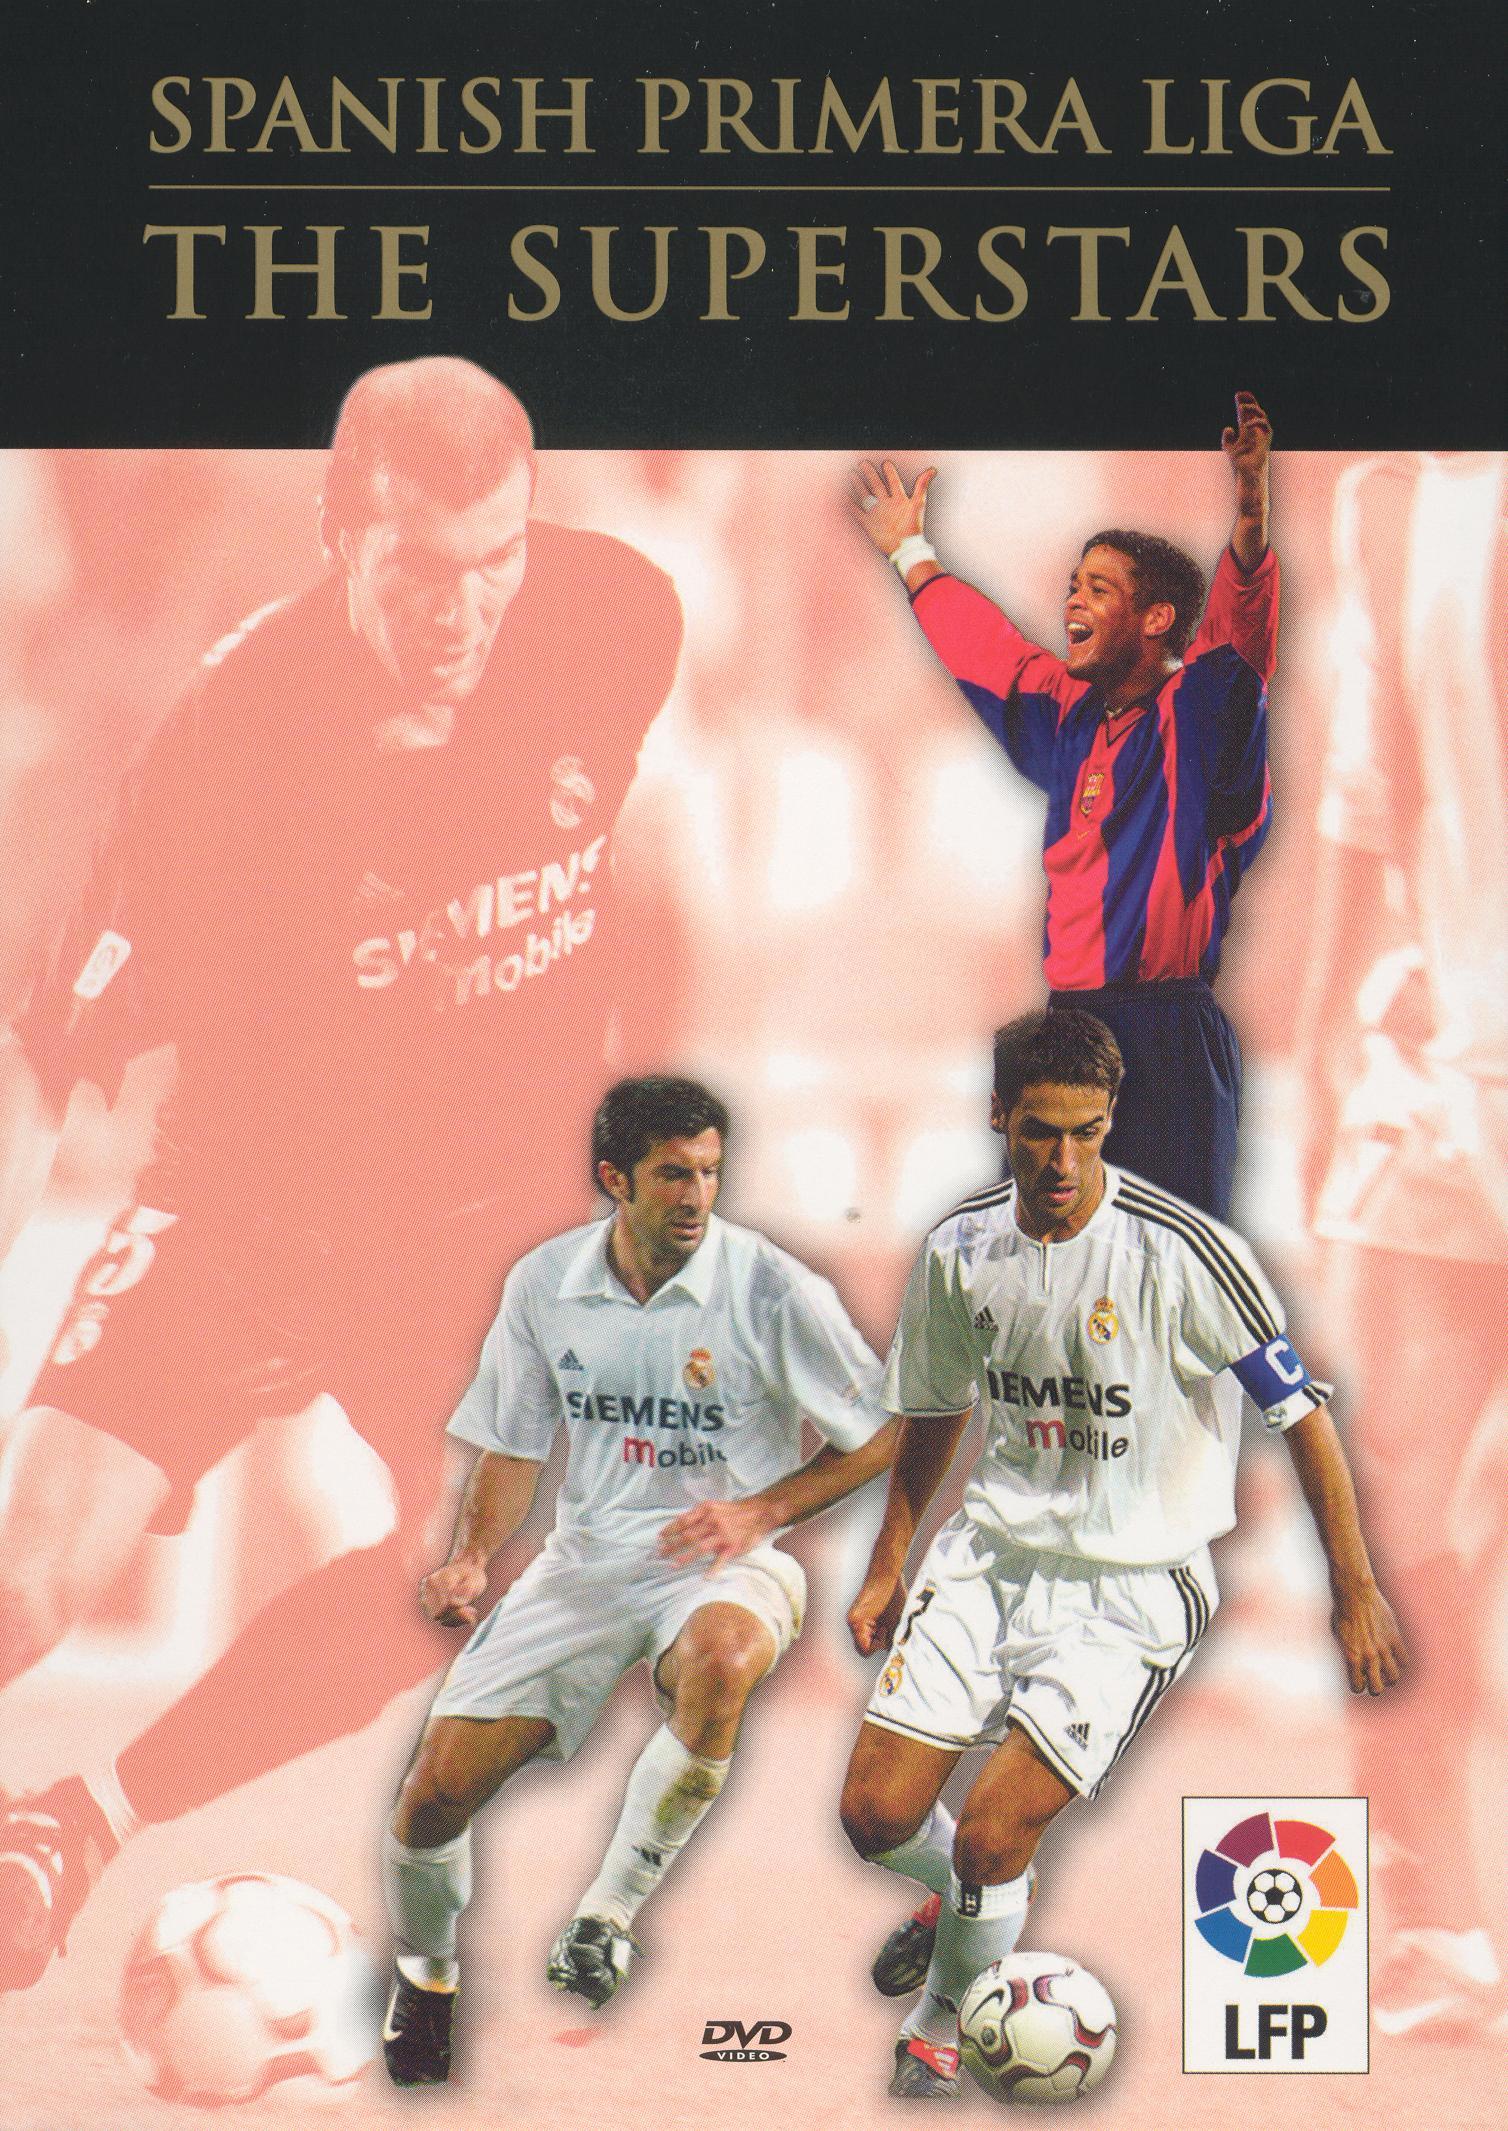 Spanish Primera Liga: The Superstars